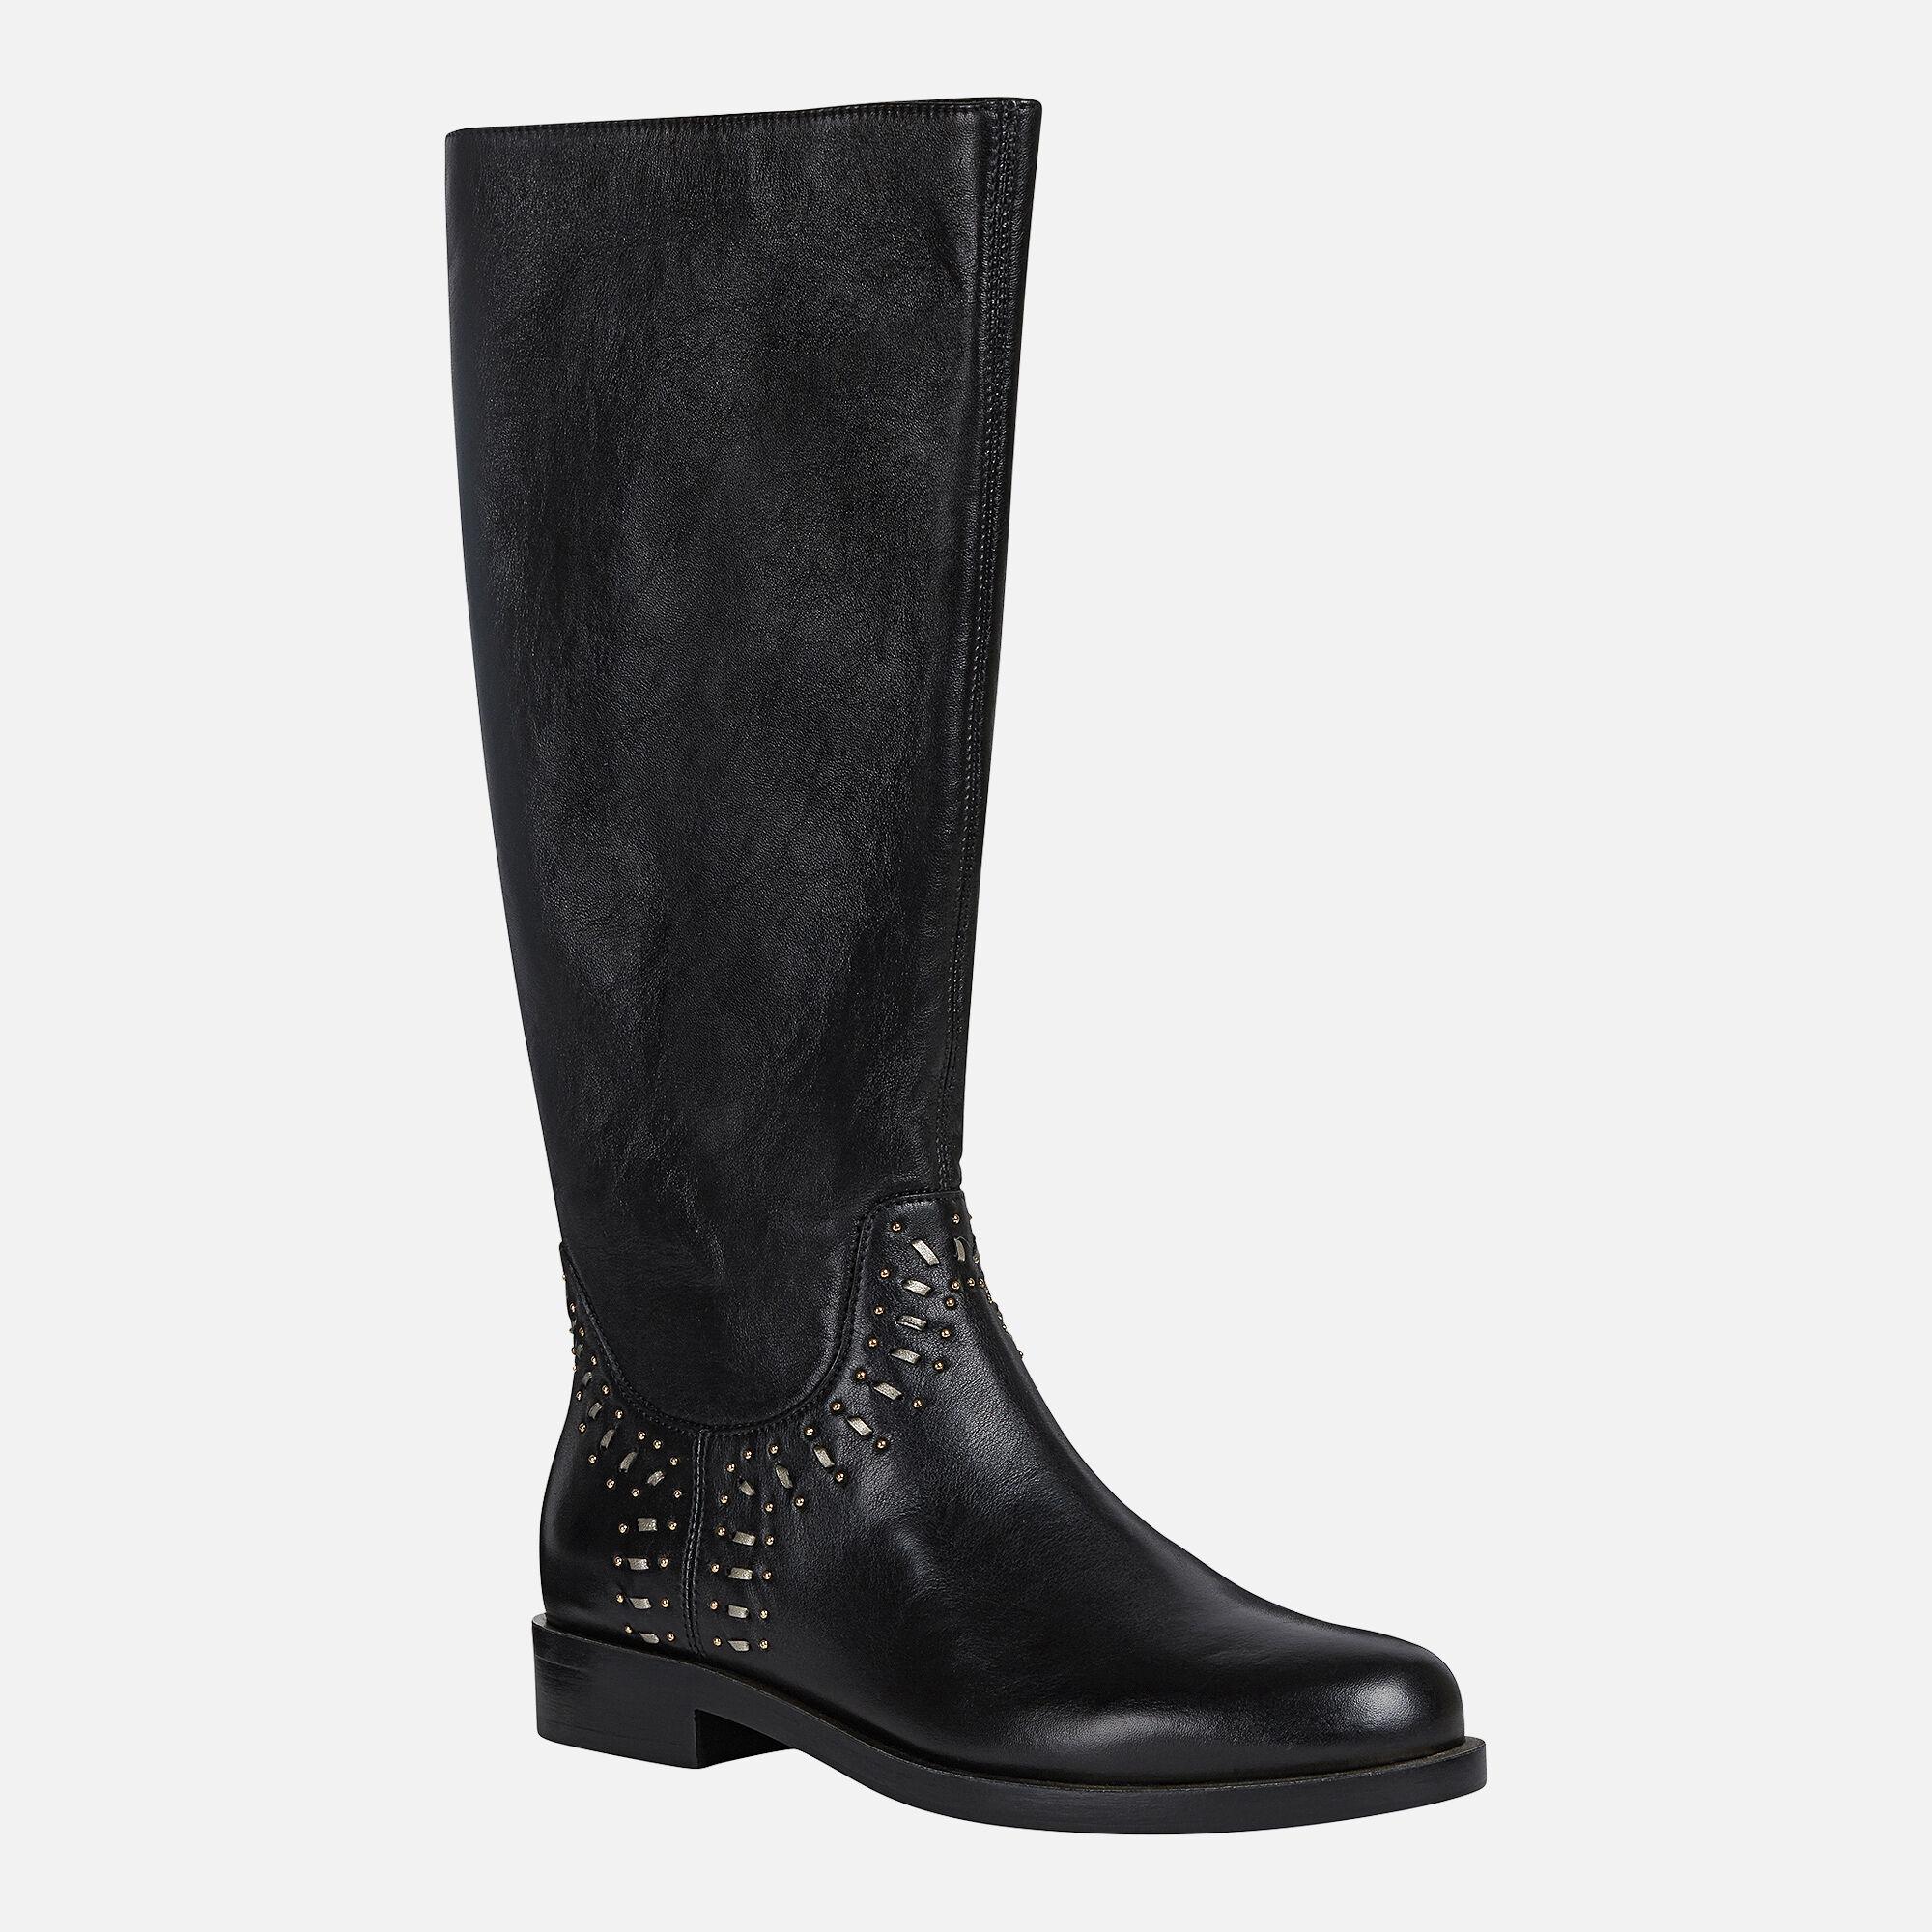 Geox BROGUE Woman: Black Boots   Geox SS20